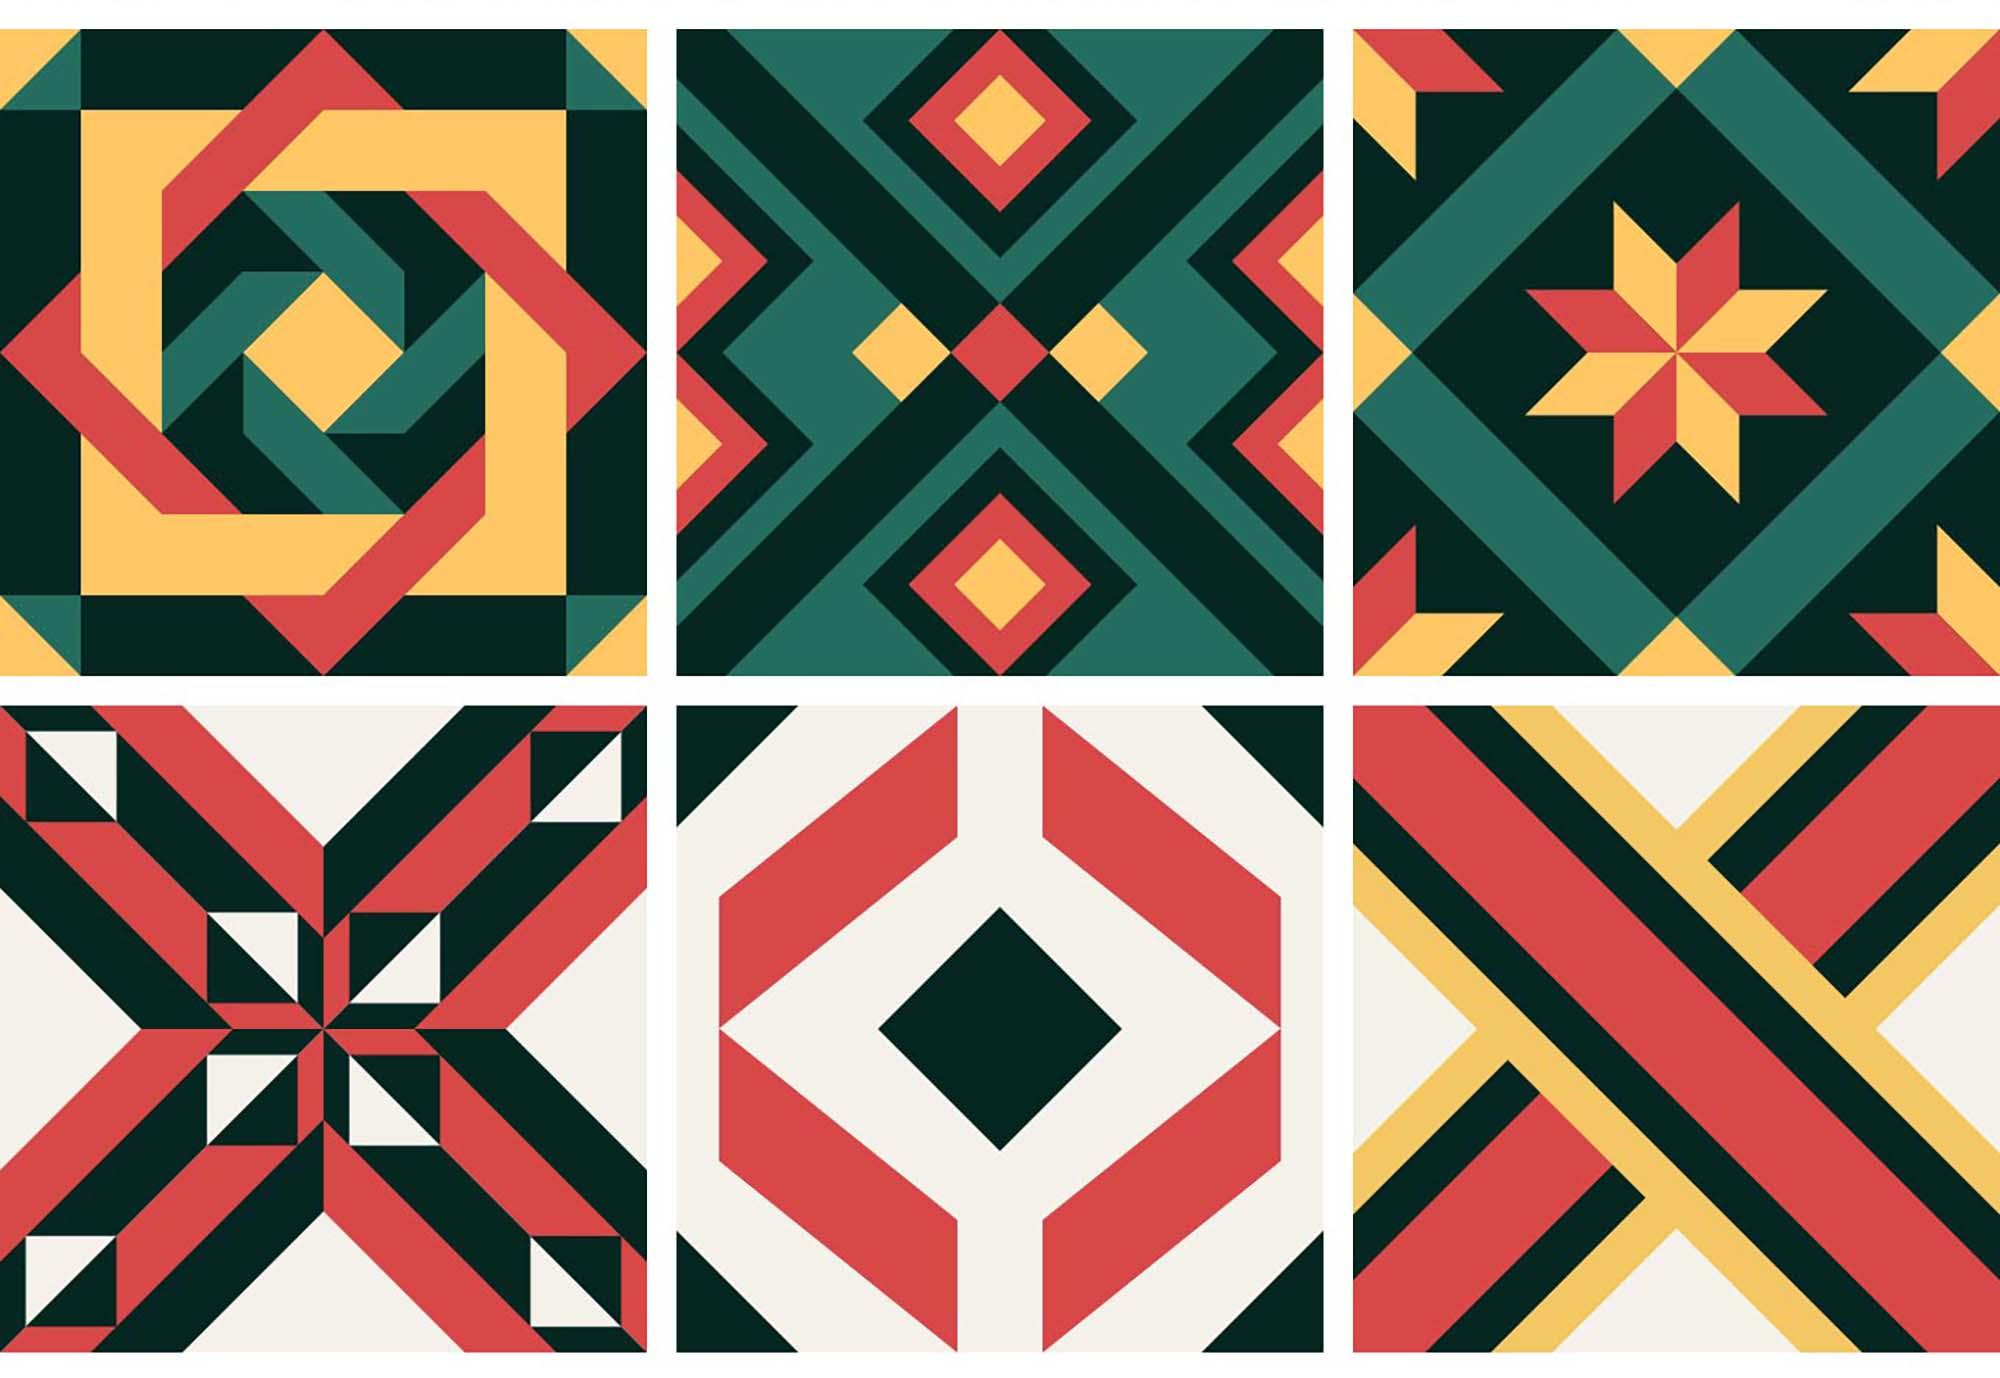 Portuguese Geometric Patterns 4